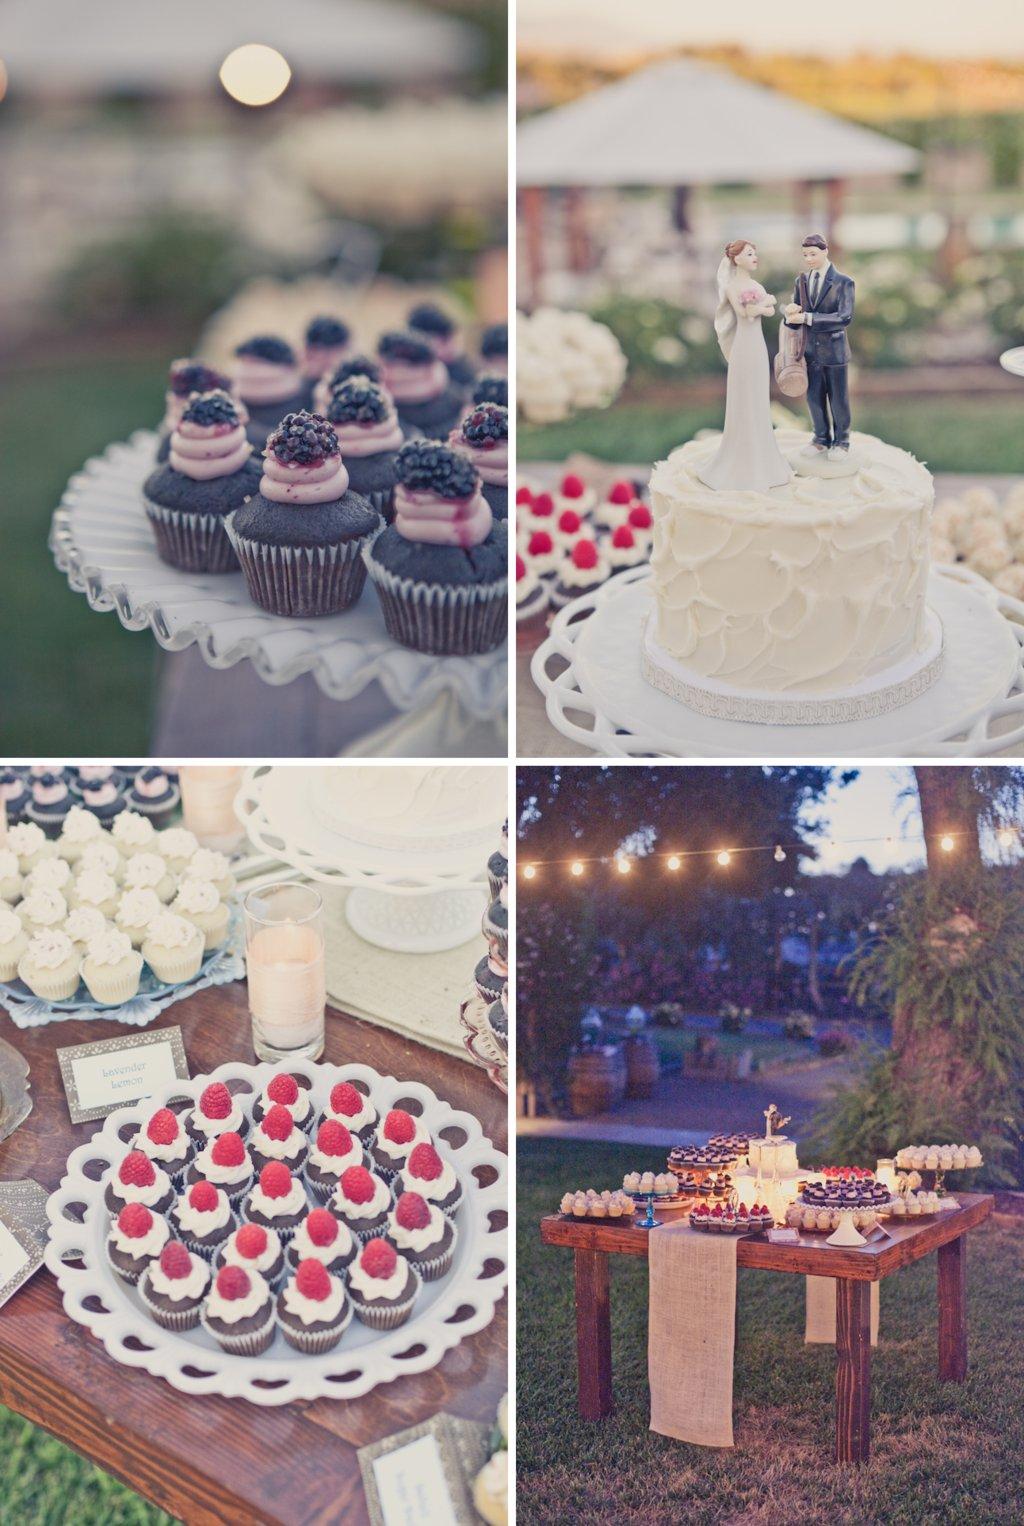 Elegant-outdoor-weddings-wedding-cake-alternatives-dessert-bar.full